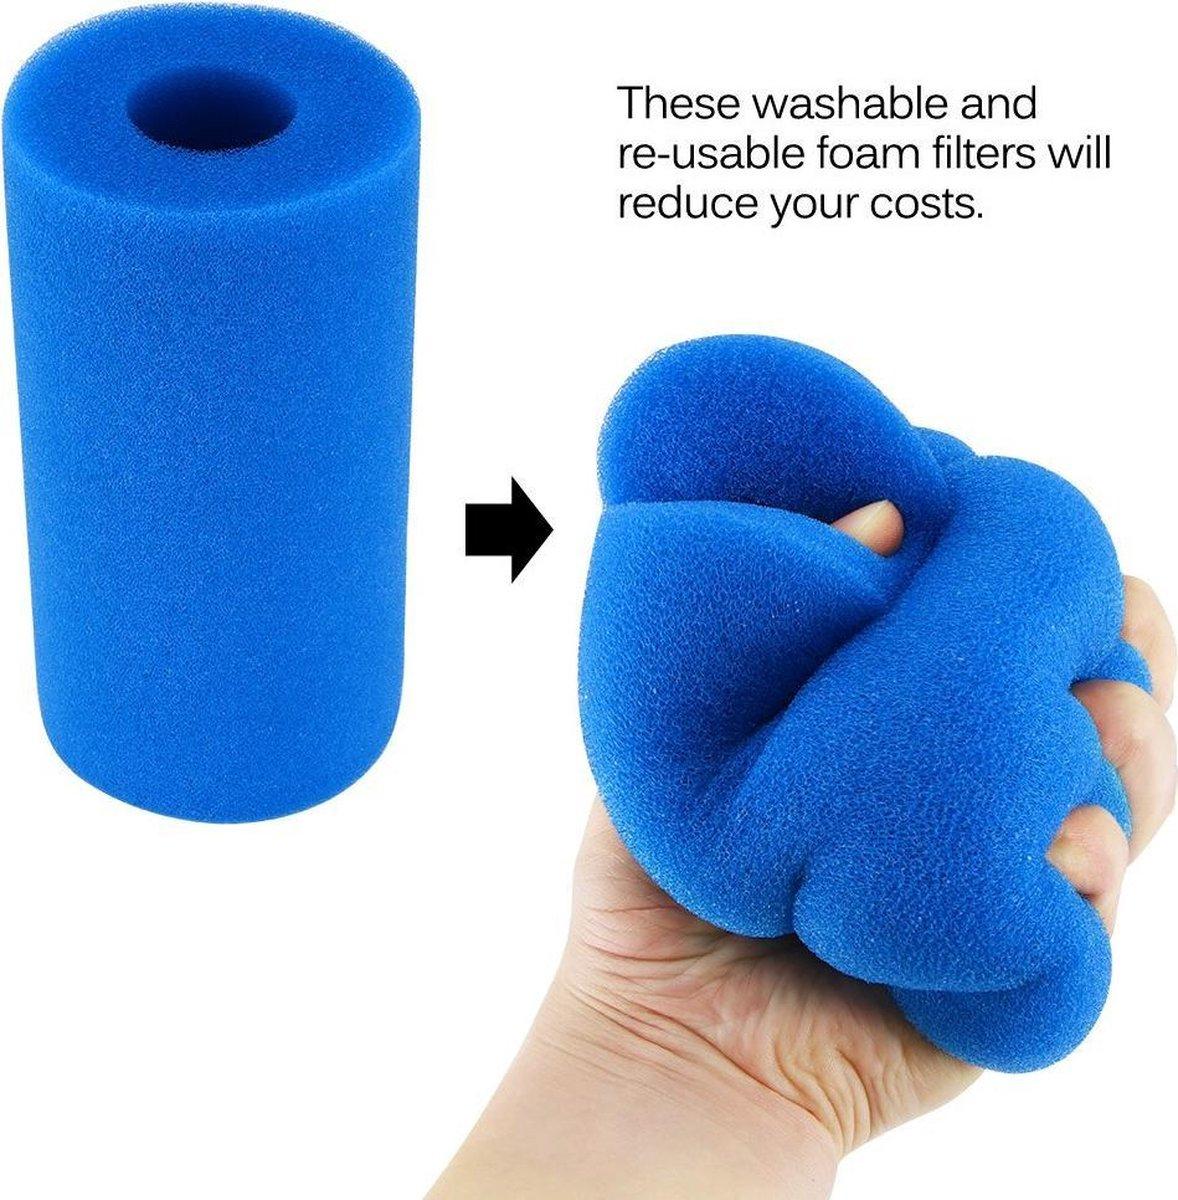 Intex Filter Type A Cartridge -Wasbaar & Herbruikbaar - Zwembad onderhoud - Intex A